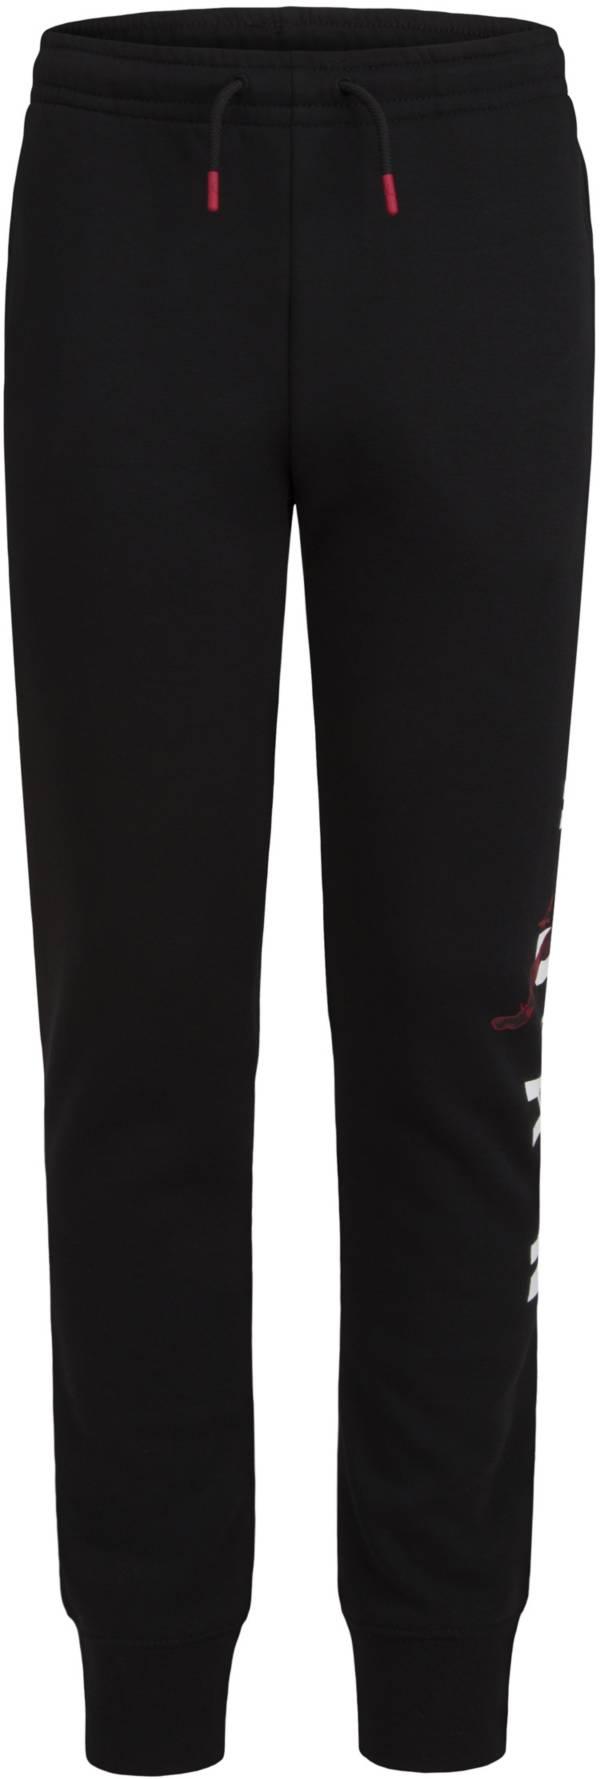 Jordan Boys' AJ6 Pants product image